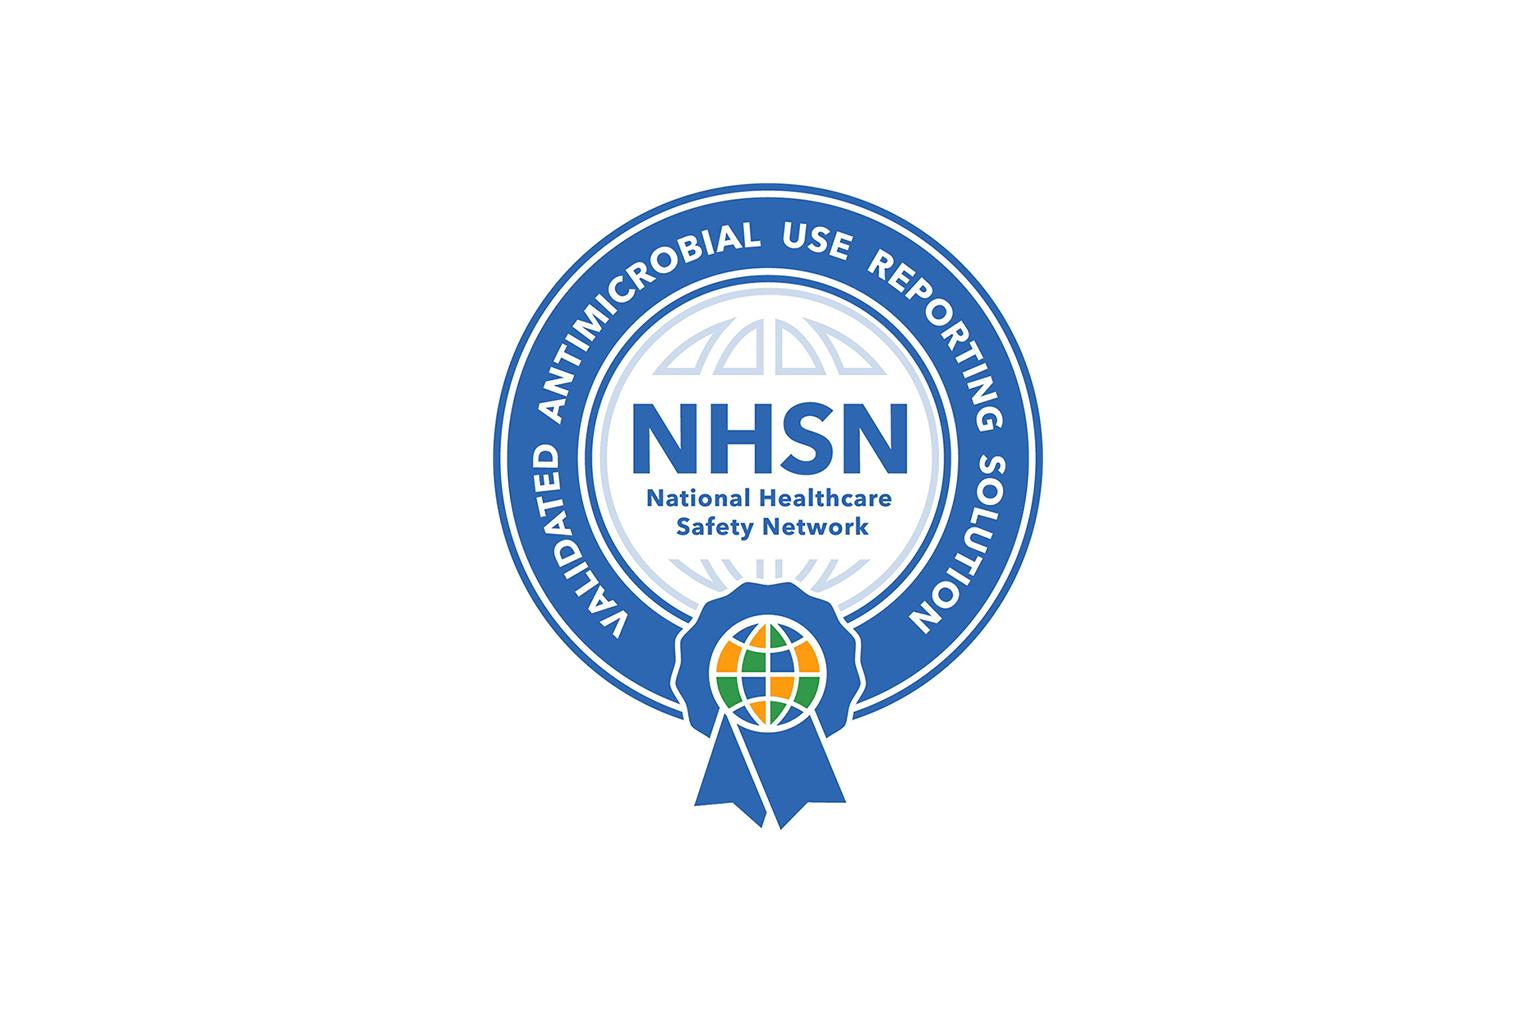 Sentri7-NSHN-validated-certificate